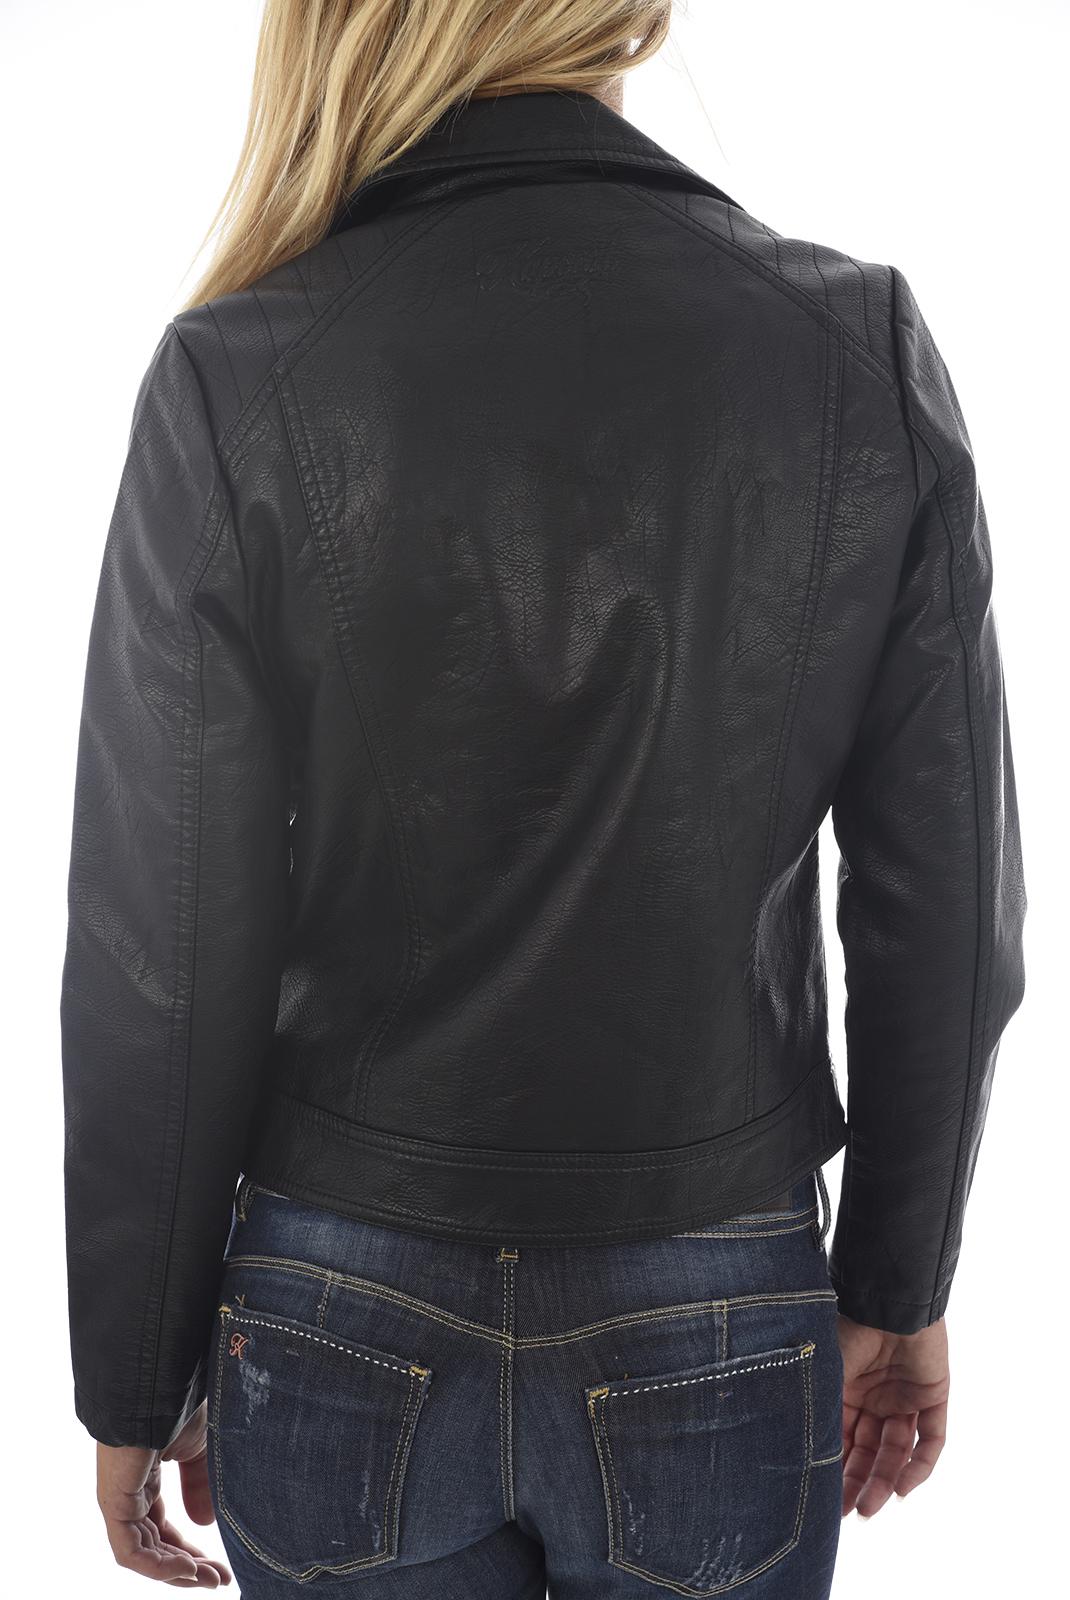 Vestes & blousons  Kaporal TESSY H18W62 BLACK